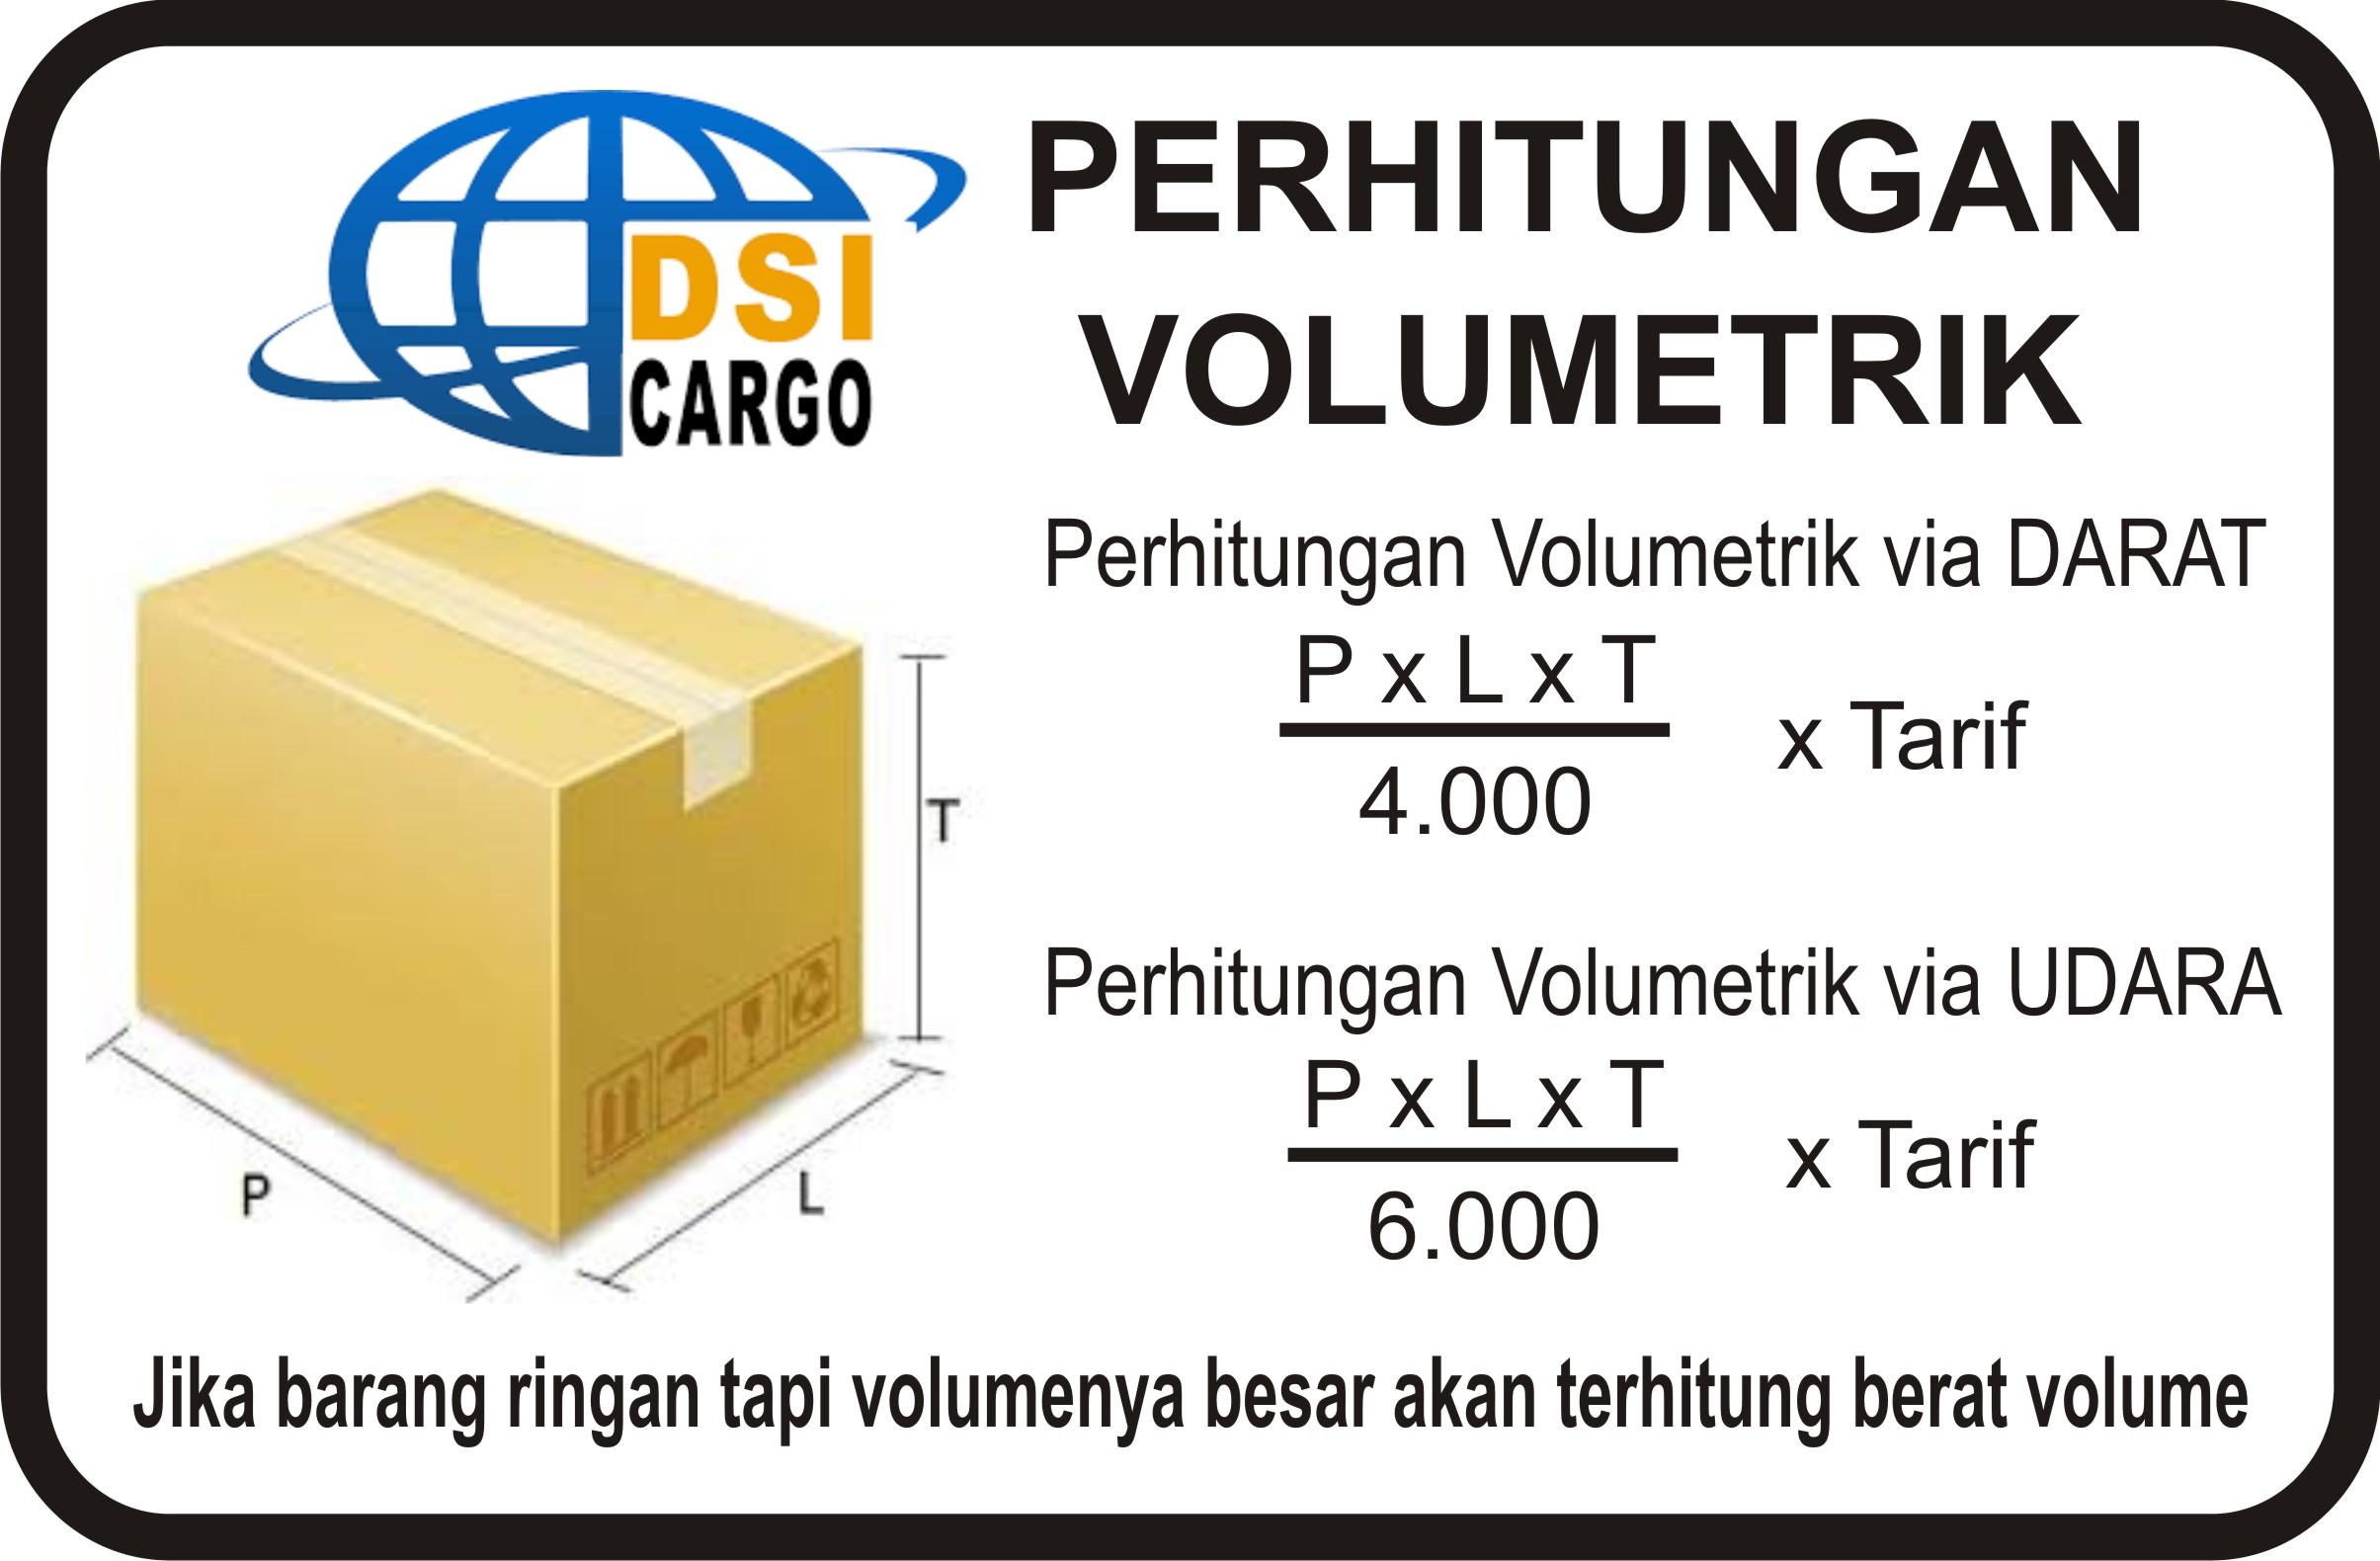 Perhitungan Volumetrik Duta Sarana Indocargo Dsi Cargo Ongkos Kirim Ekspedisi